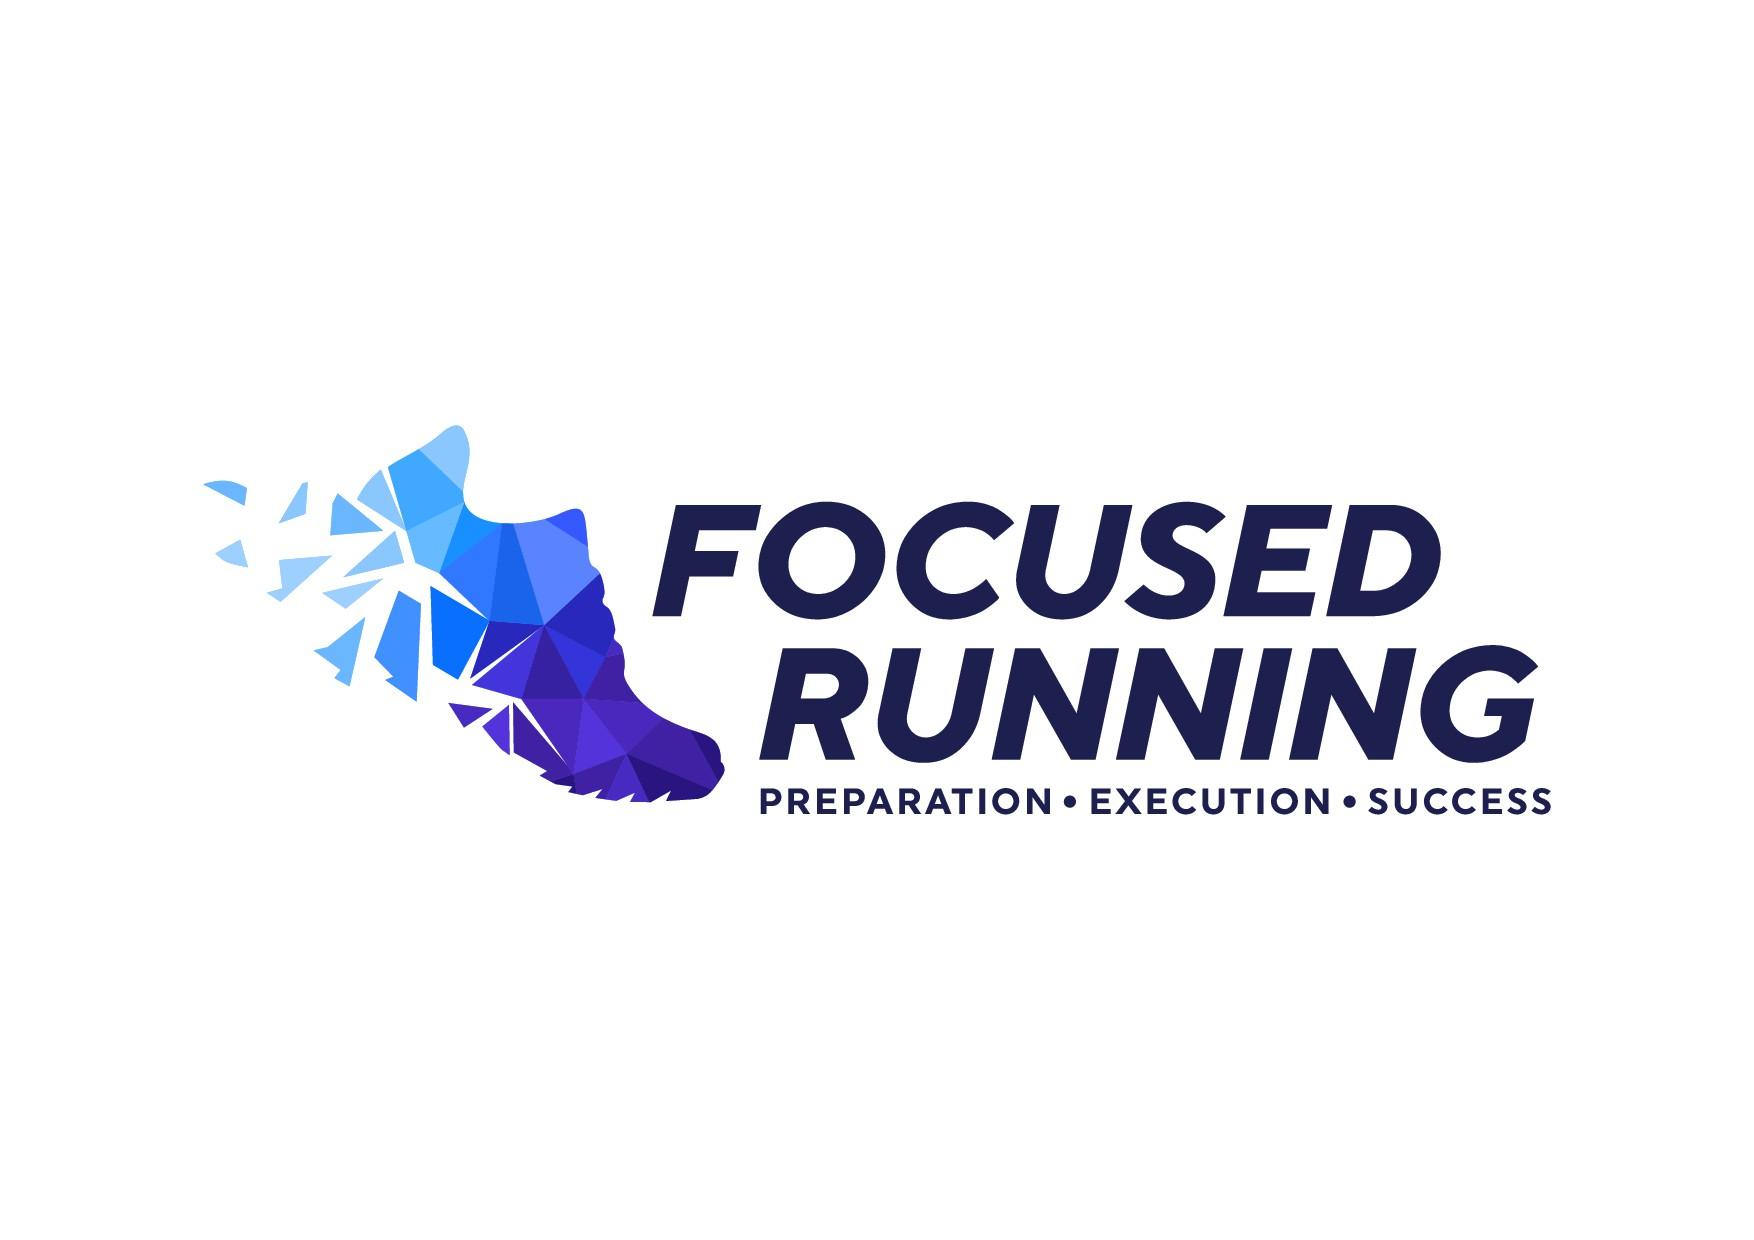 Professional Performance running logo needed, improving body dynamics & fitness